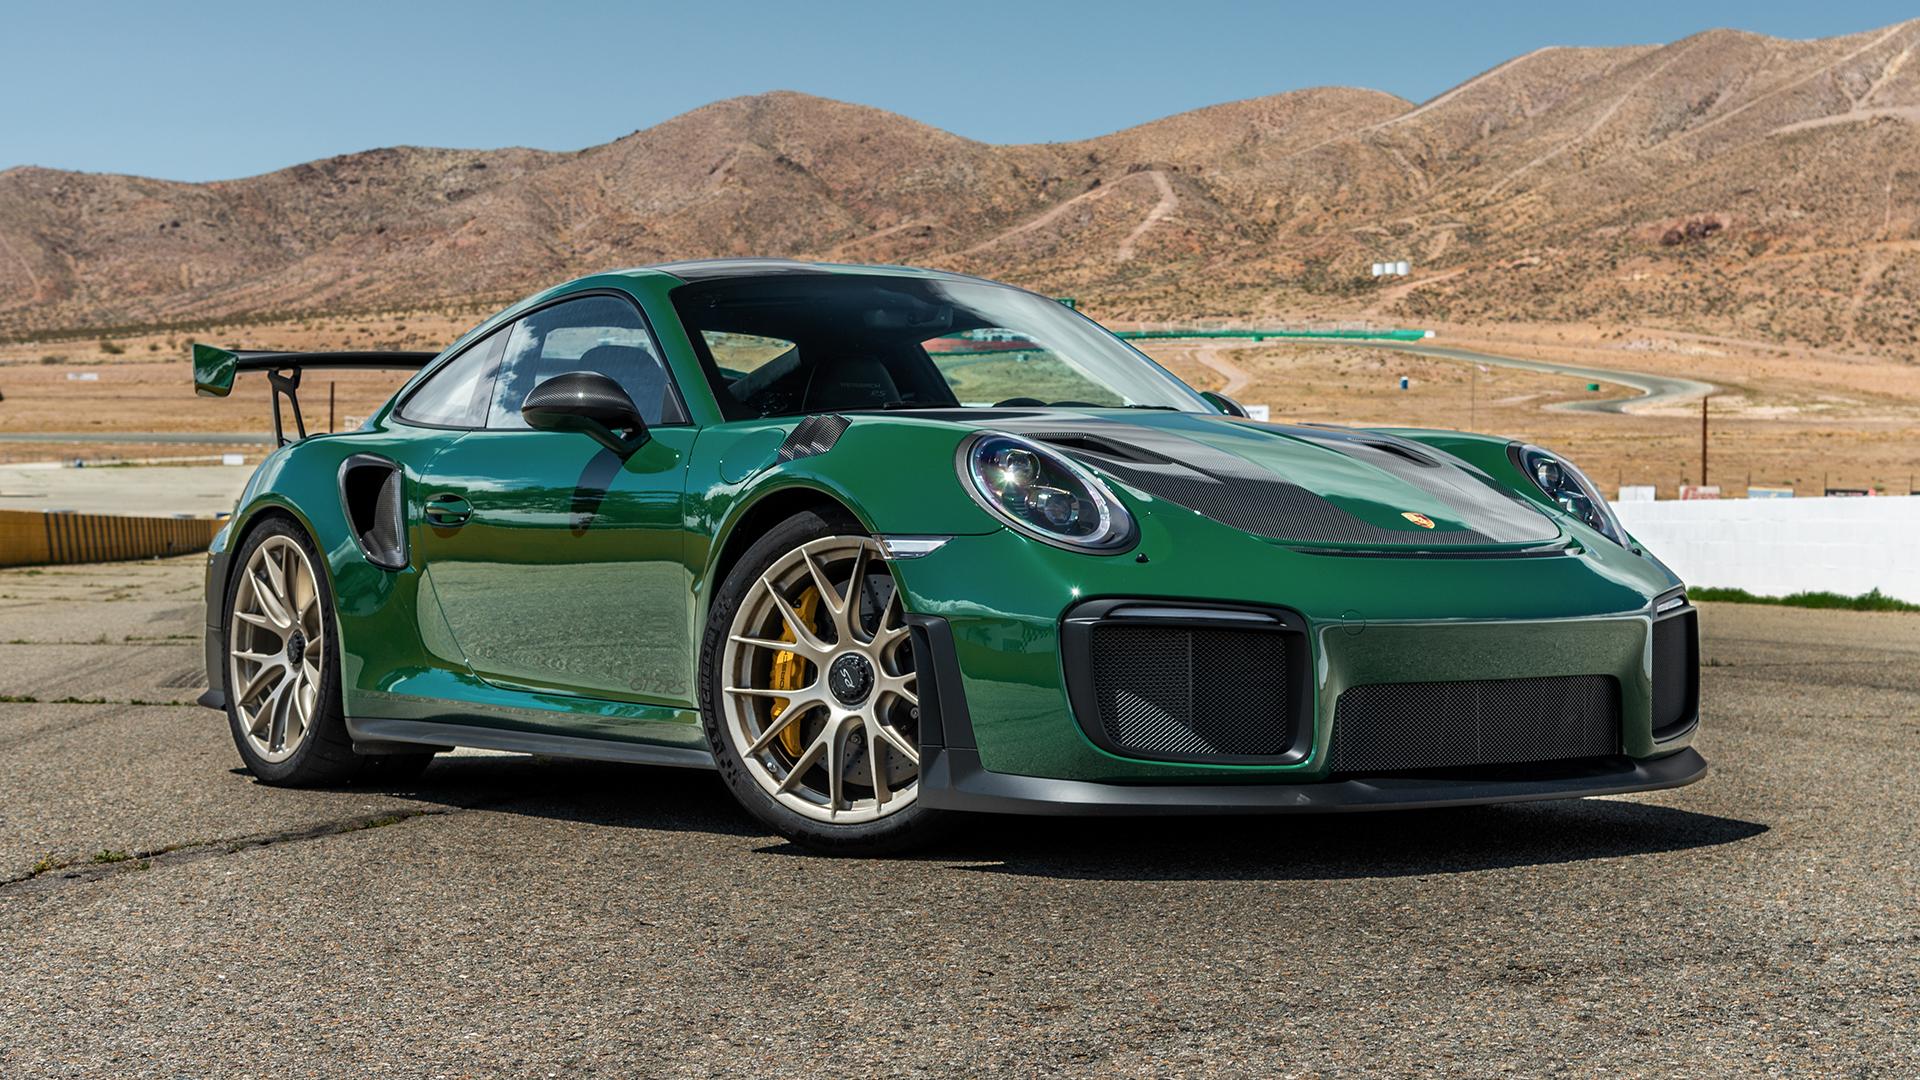 Ignition 2018 Porsche 911 Gt2 Rs Return Of The Widowmaker Tv Episode 2018 Imdb